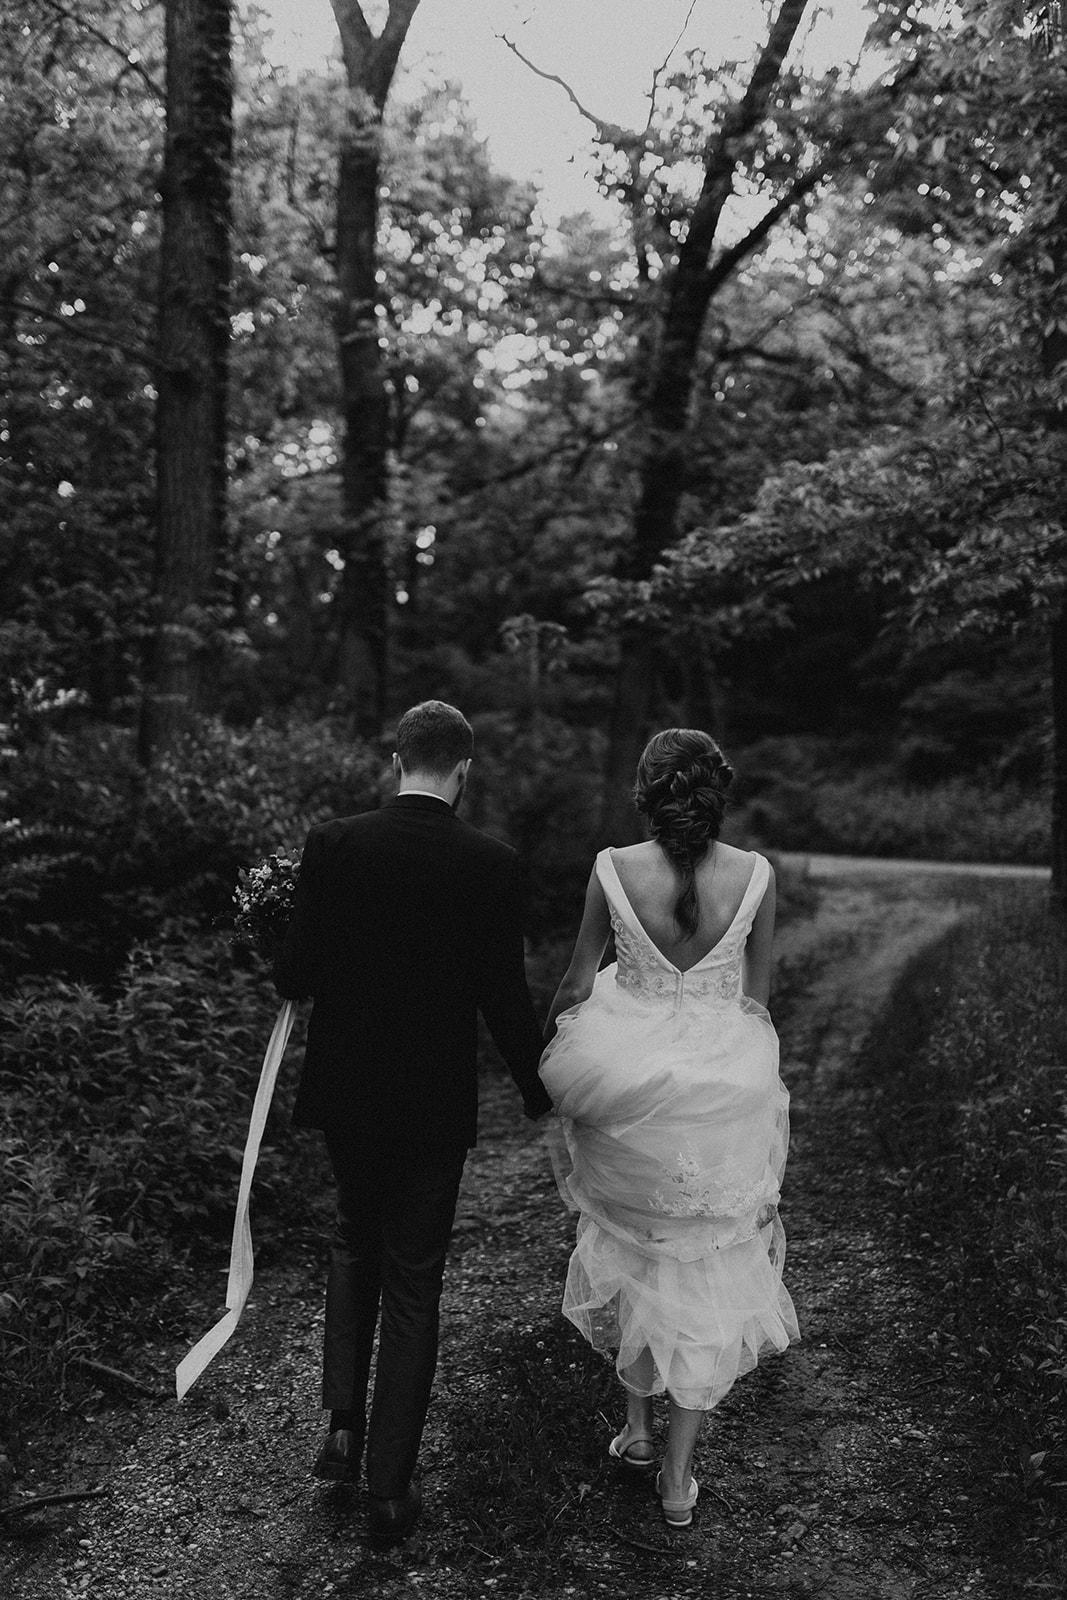 camp_wokanda_peoria_illinois_wedding_photographer_wright_photographs_bliese_0833.jpg